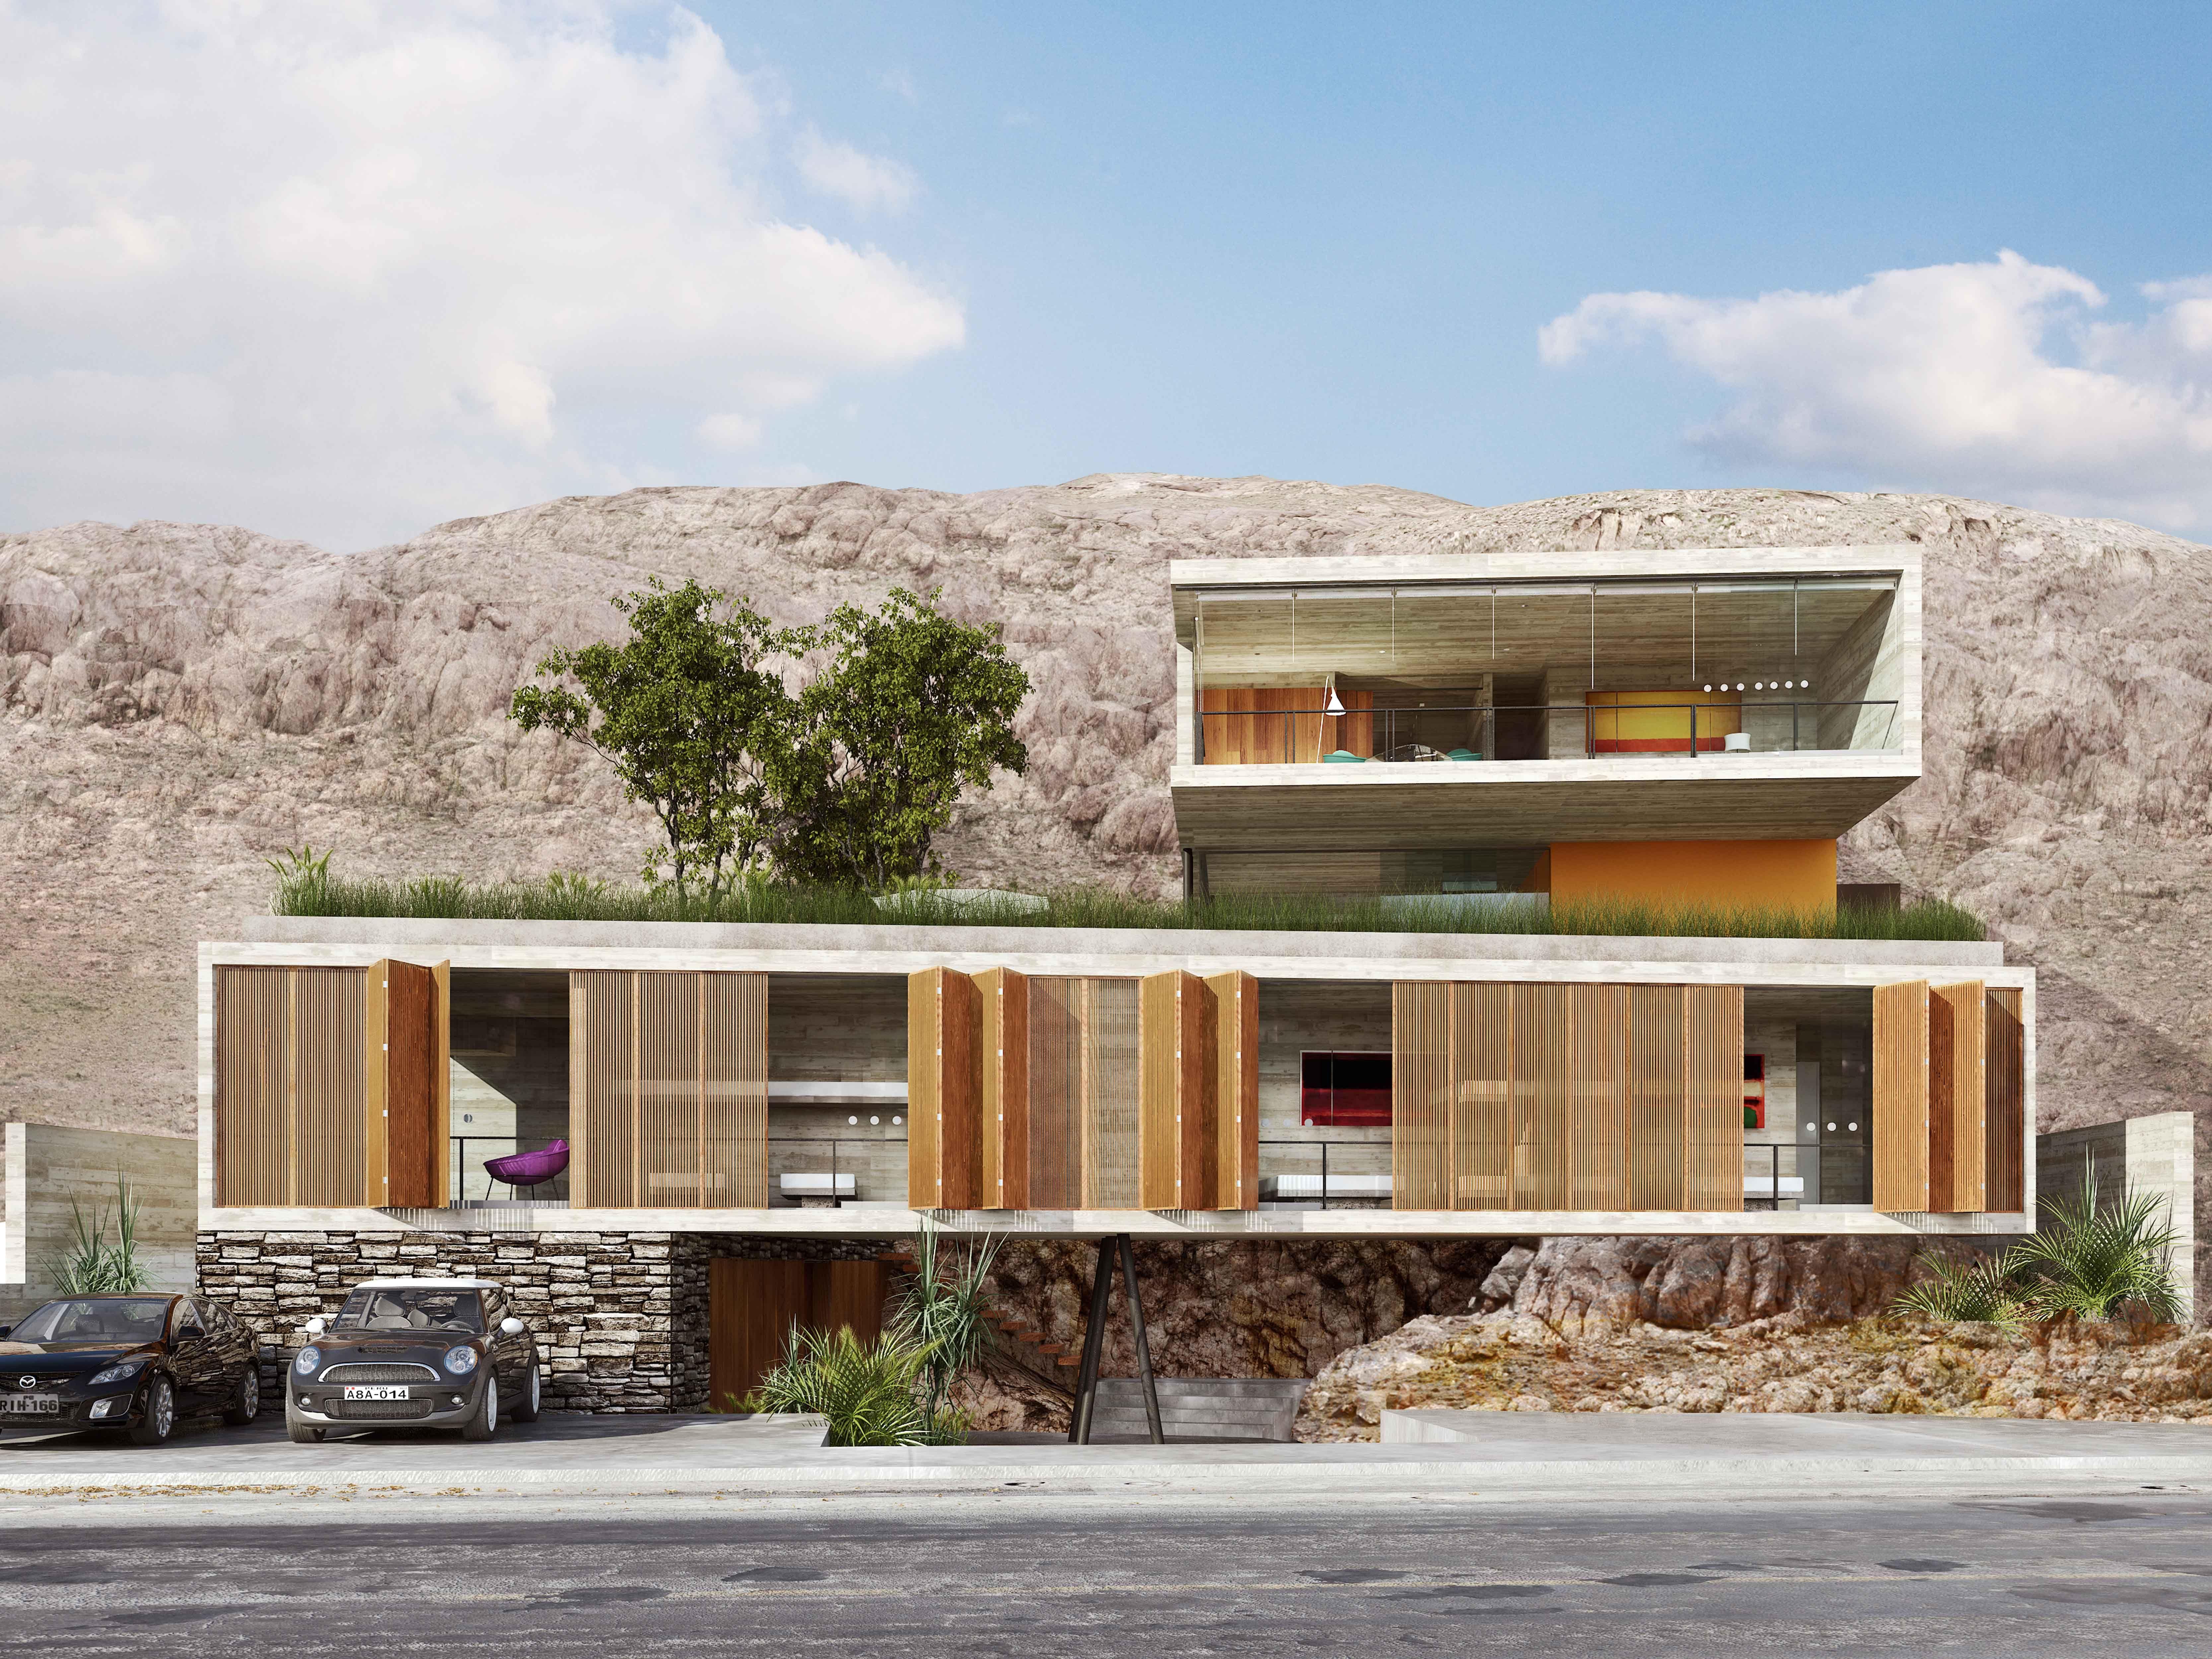 House window sunshade design  casapulg   back house  pinterest  concrete